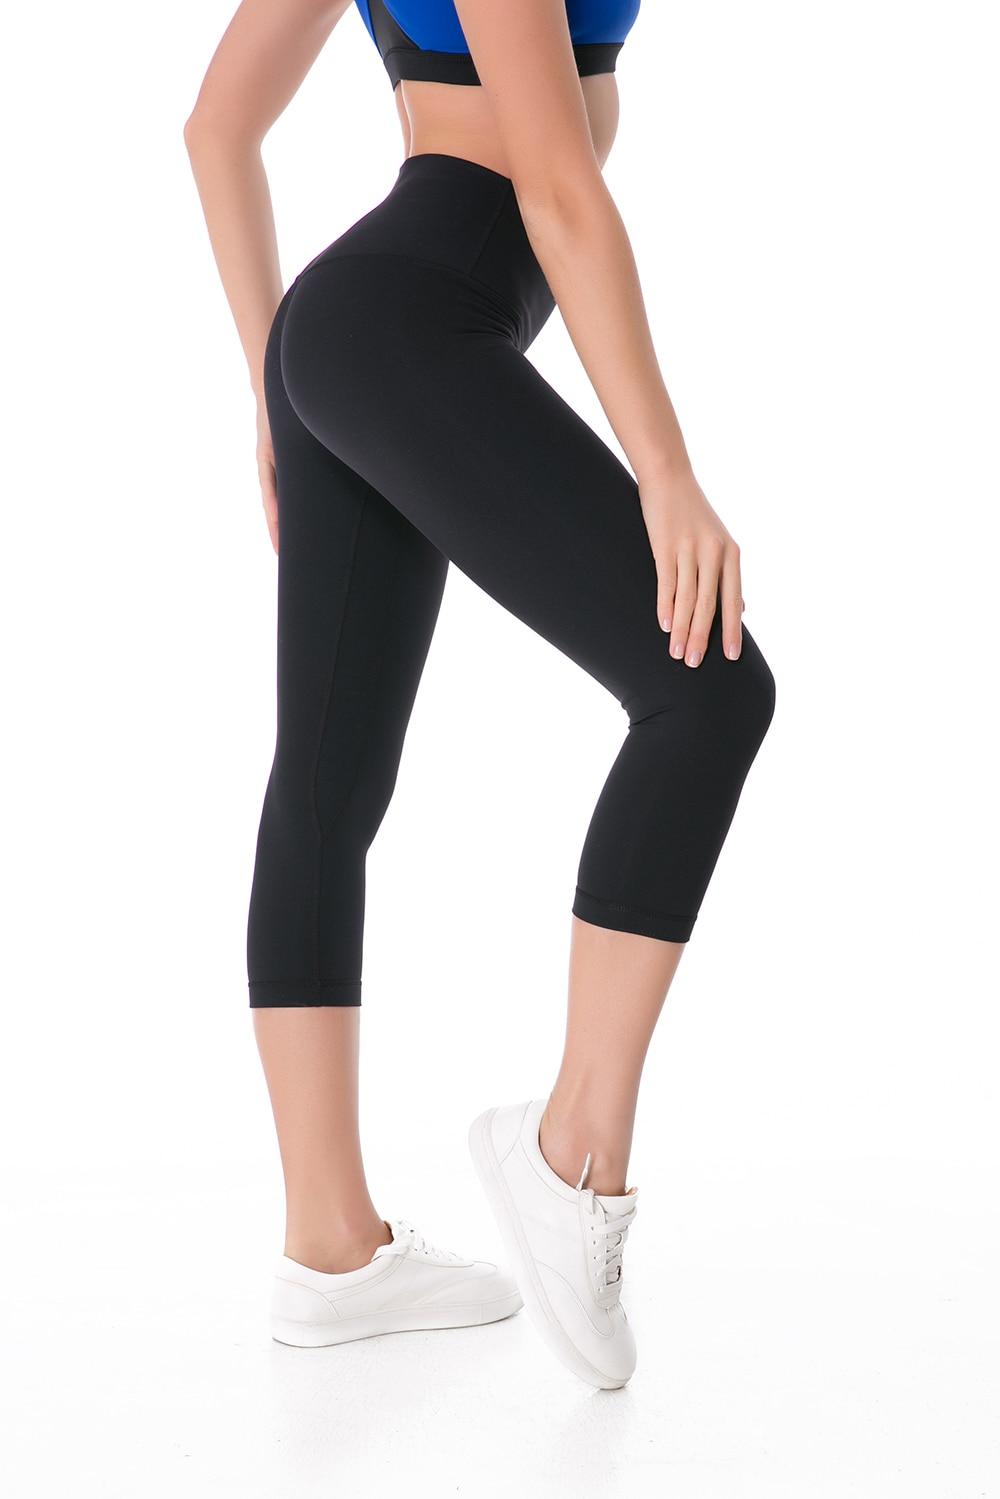 2c722c9795519 Lulu Gym Capris Crop Sexy Tummy Control Super Quality Hidden Pocket Size  US4-US12